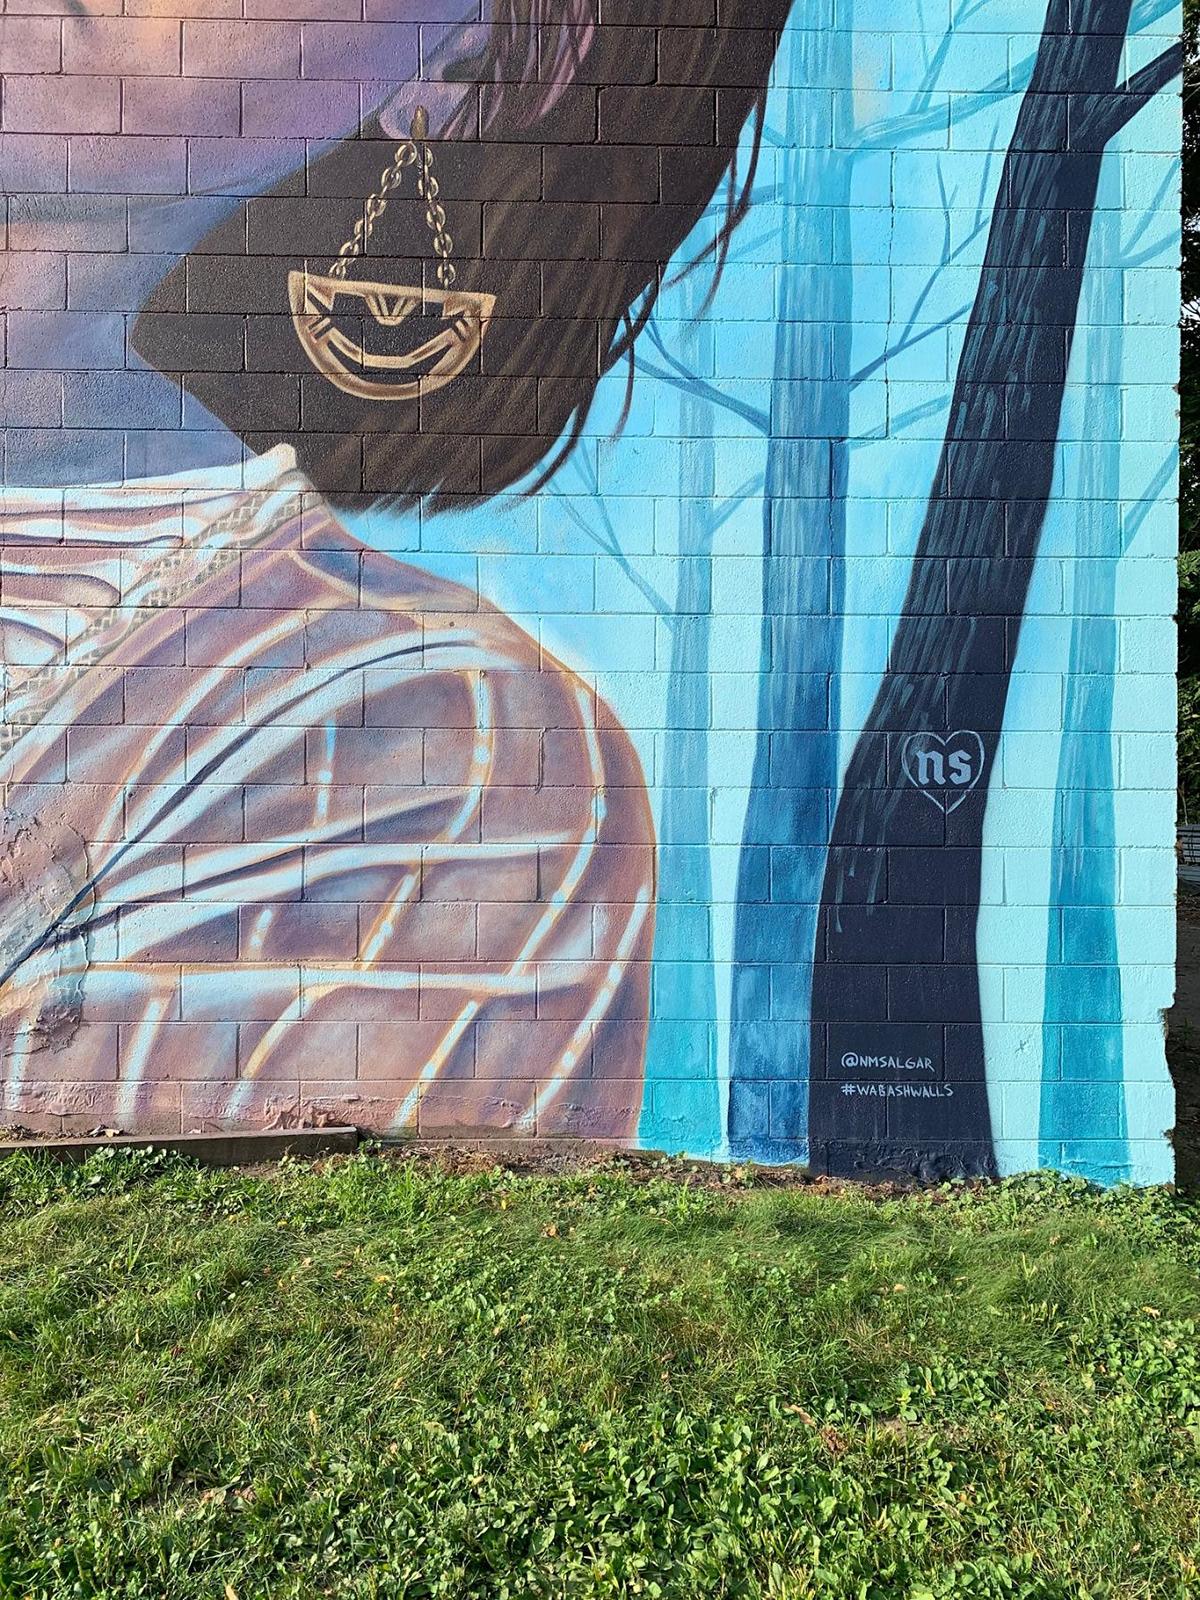 design interiordesign Mural Murals painter painting   smallBusiness streetart wallart Womanownedbusiness